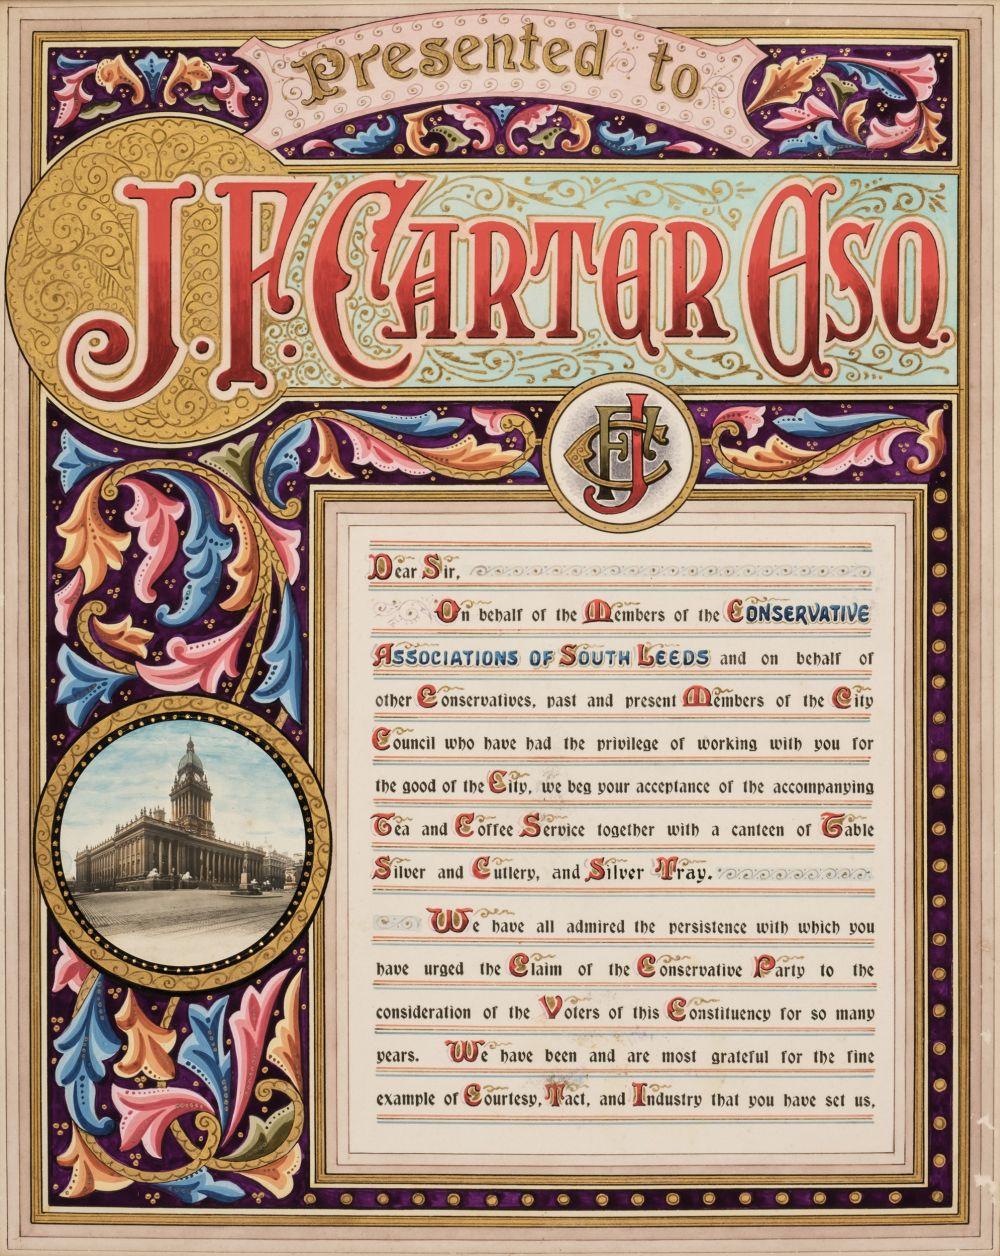 Illuminated address. To J.F. Carter on behalf of ... Conservative Associations of South Leeds, 1911